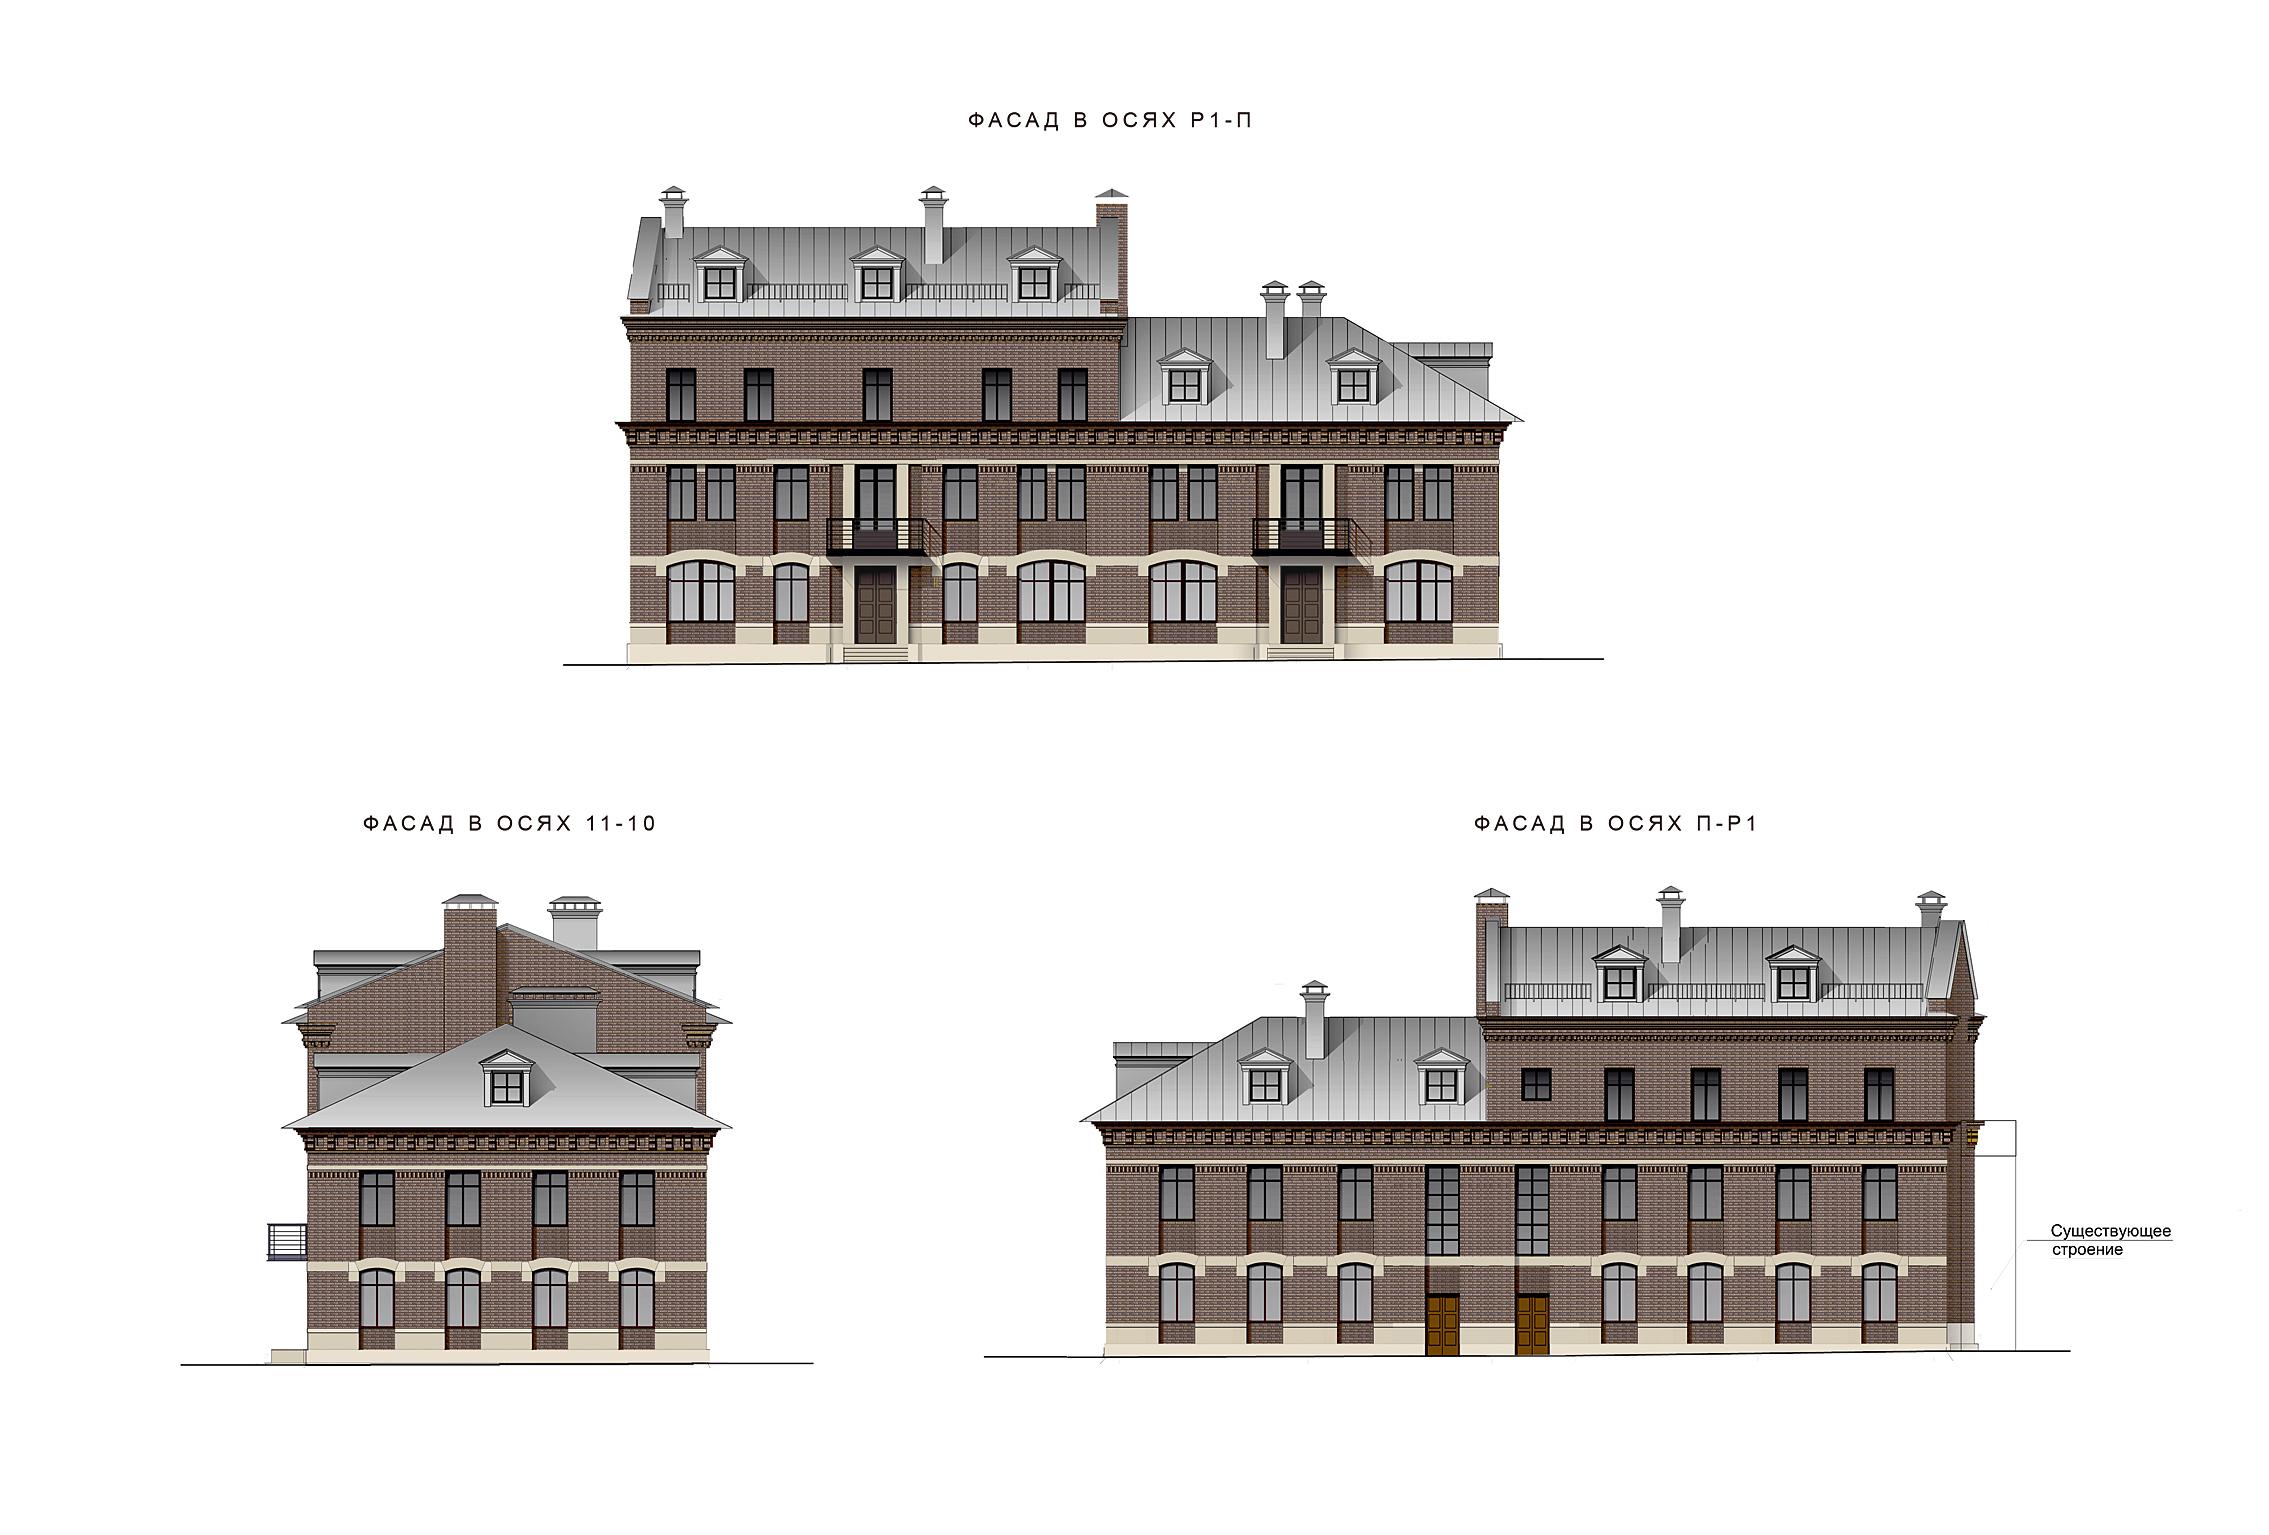 BUILDING 5